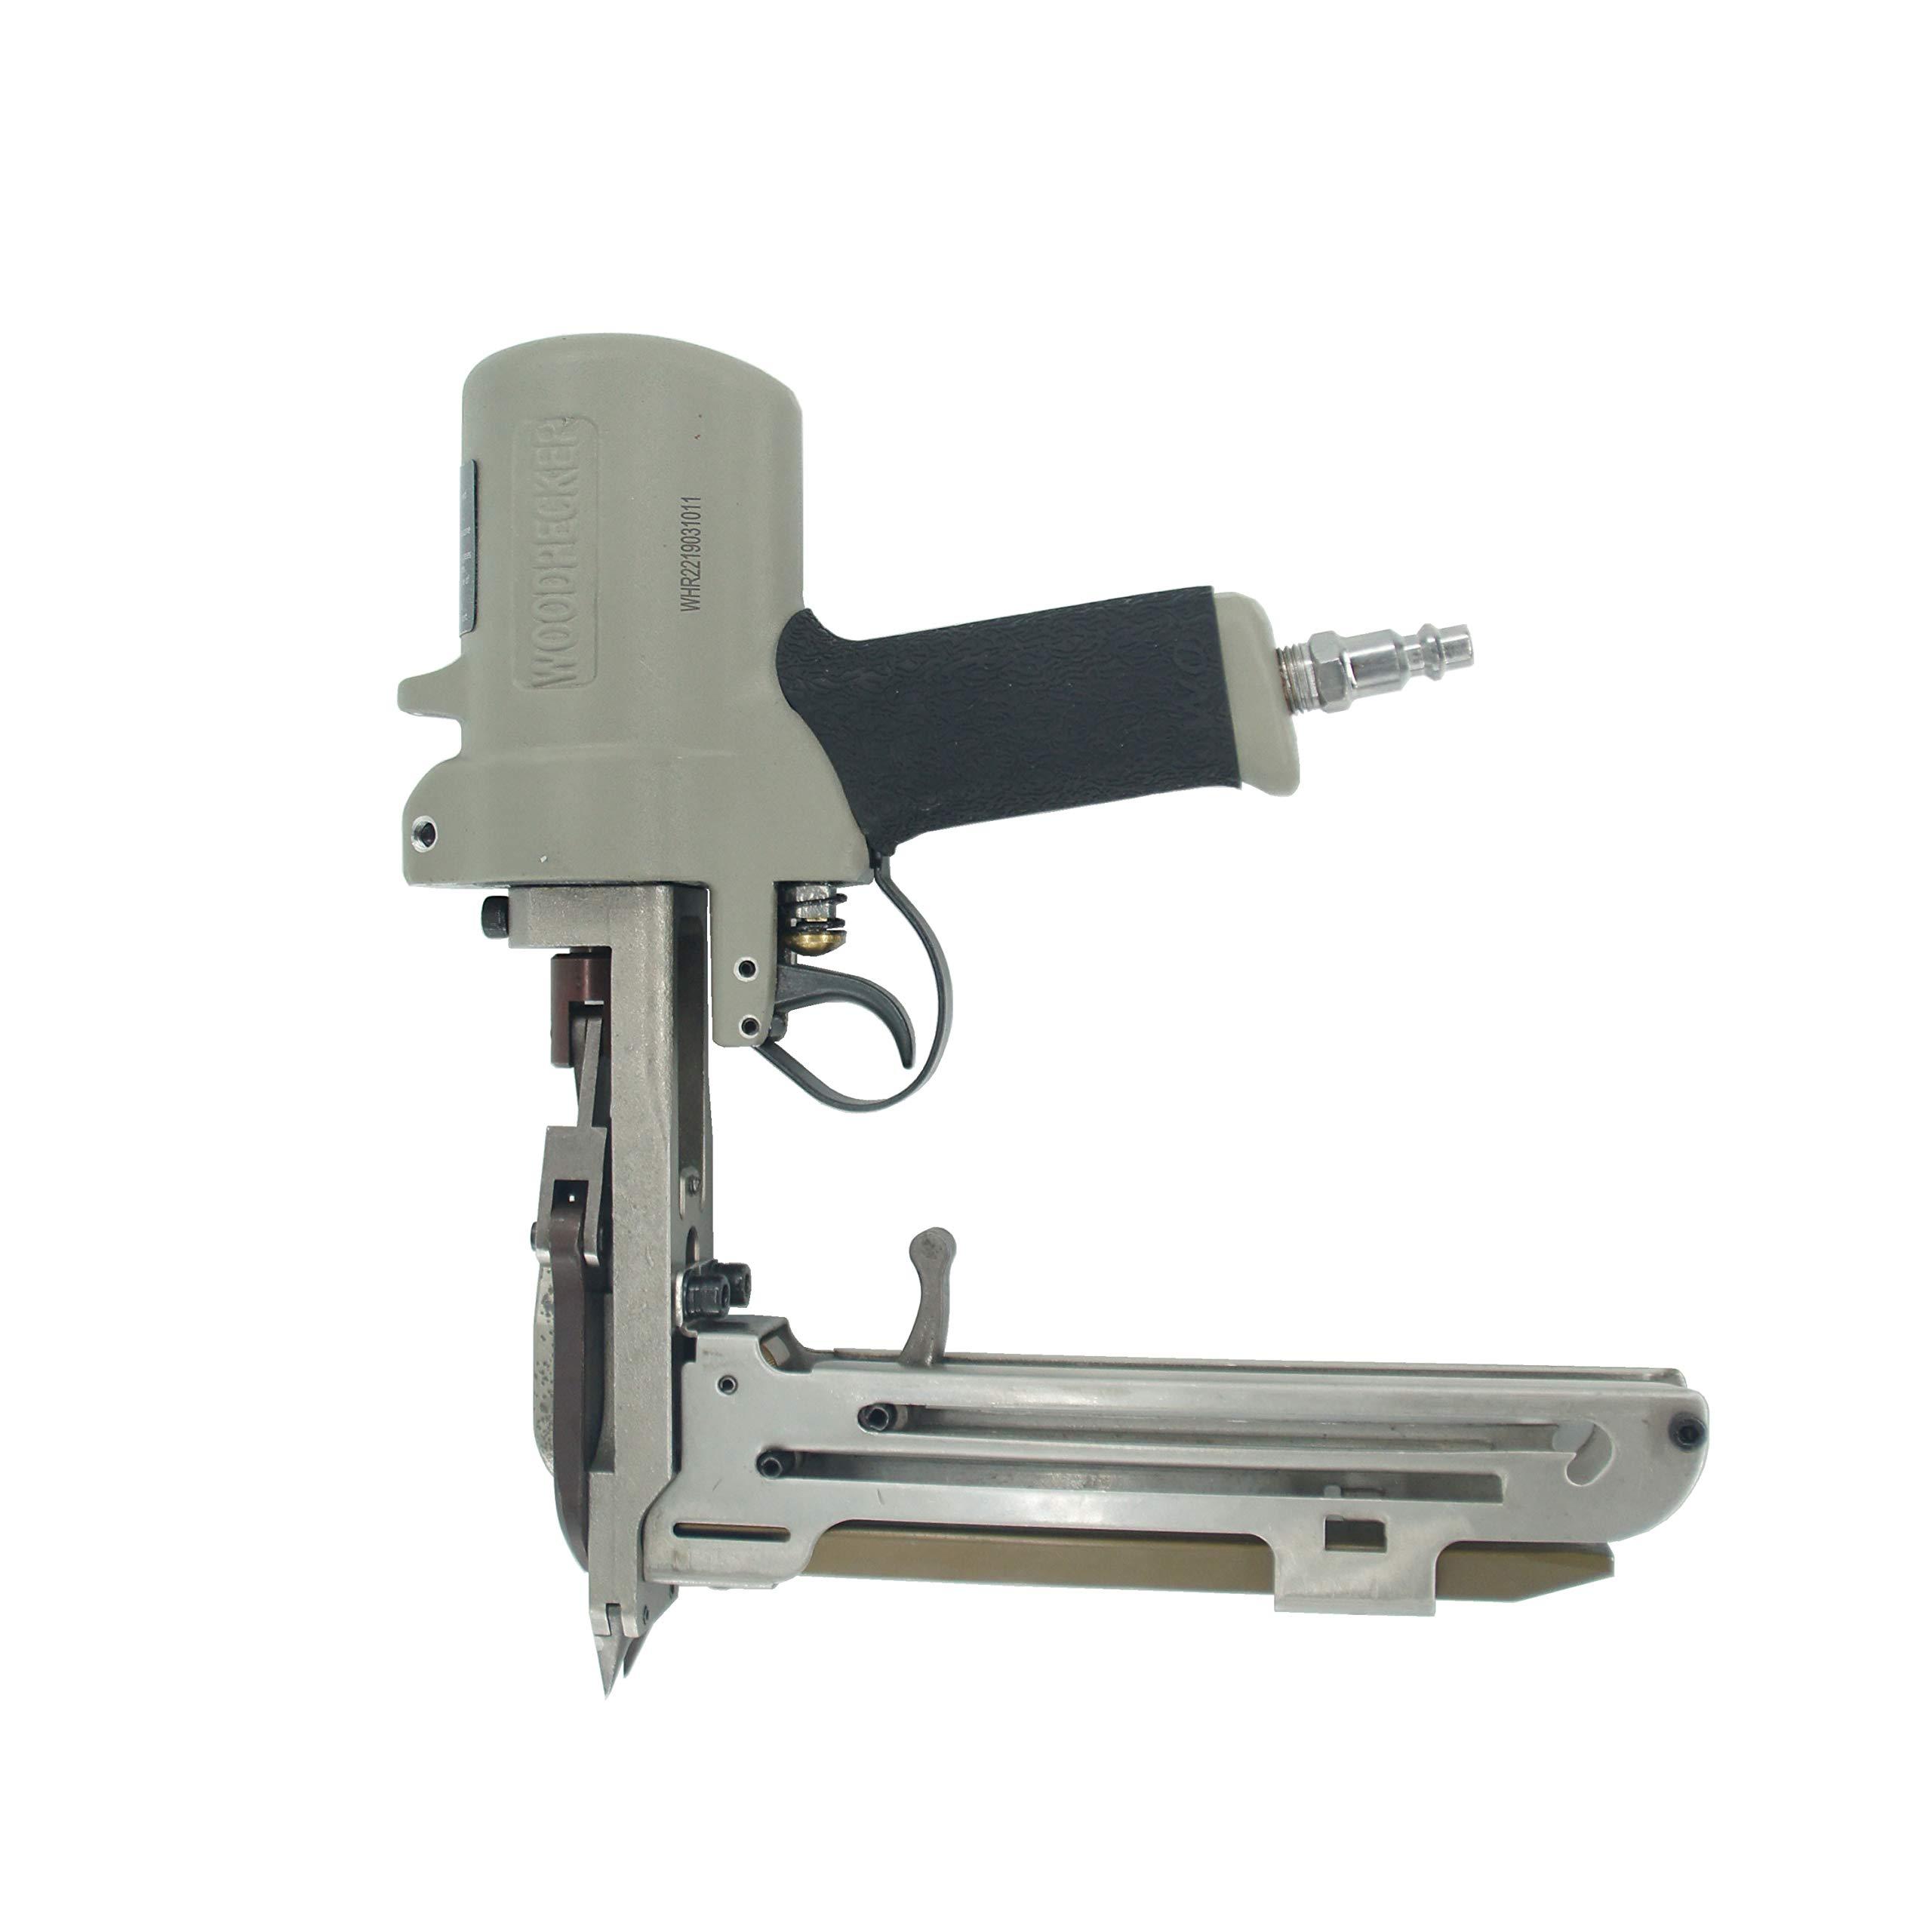 Woodpecker HR-22 Hog Ring Plier 15 guage 3/4-Inch Air Pneumatic Long Magazine Hog Ring Plier D-Ring Gun Hog Ringer Gun